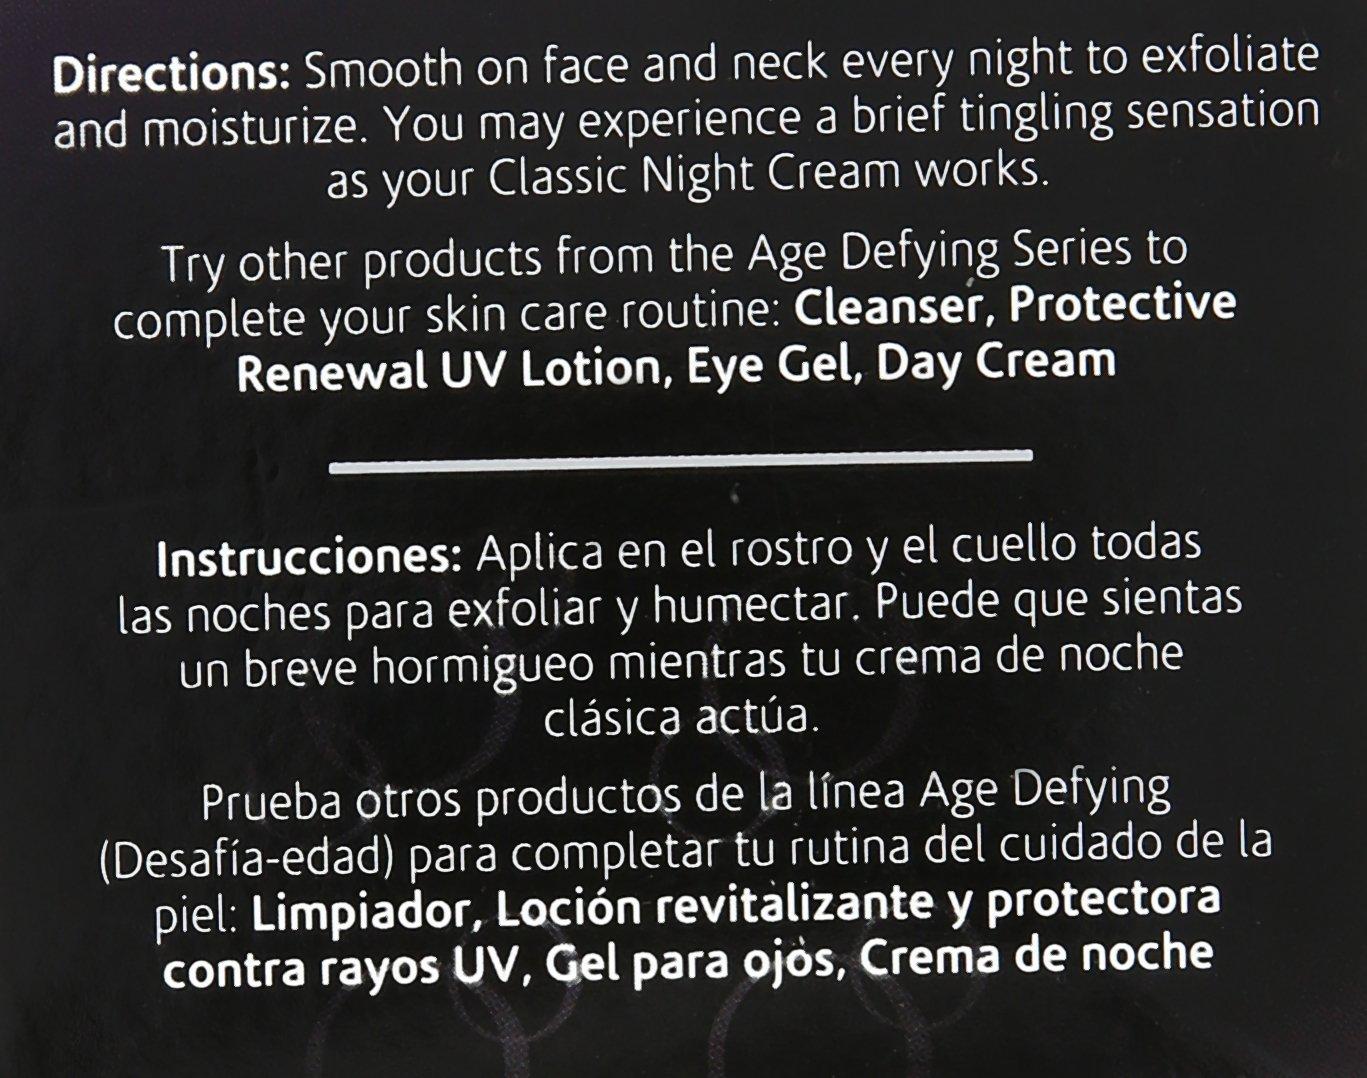 OLAY Age Defying Classic Night Cream 2.0 oz by Olay